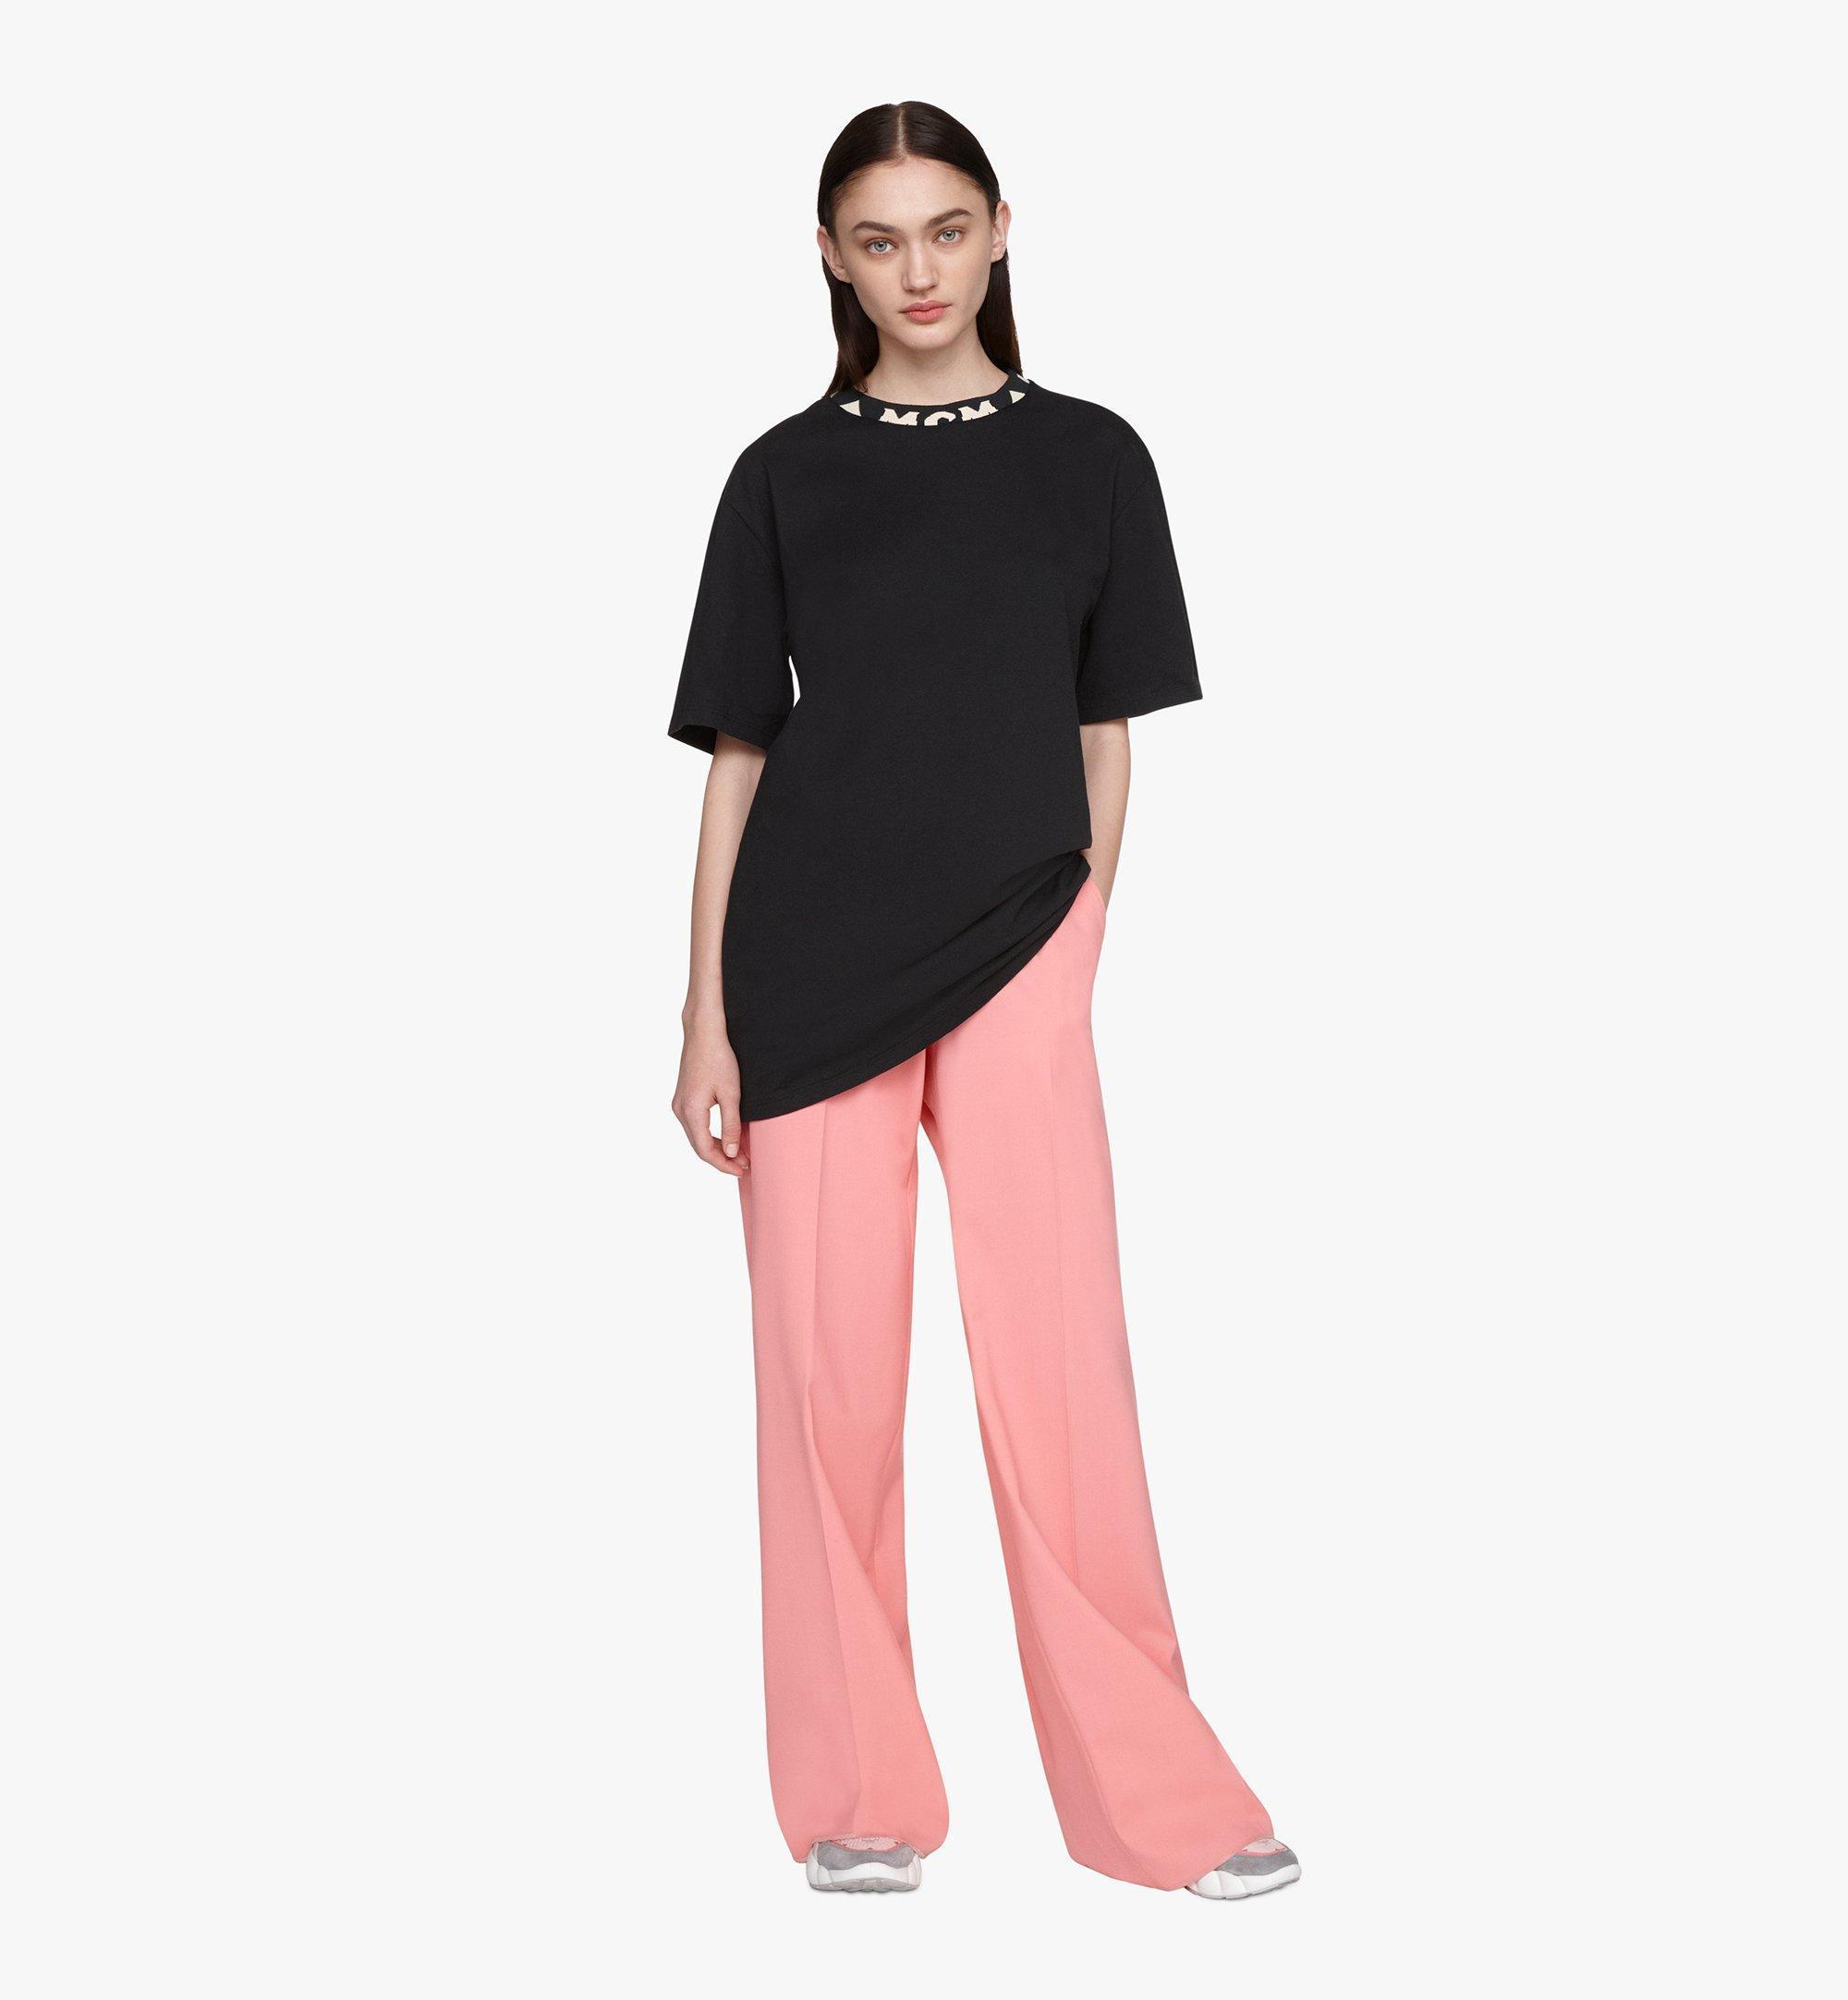 MCM メンズ ロゴトリム Tシャツ Black MHTASMM03BT00L Alternate View 4